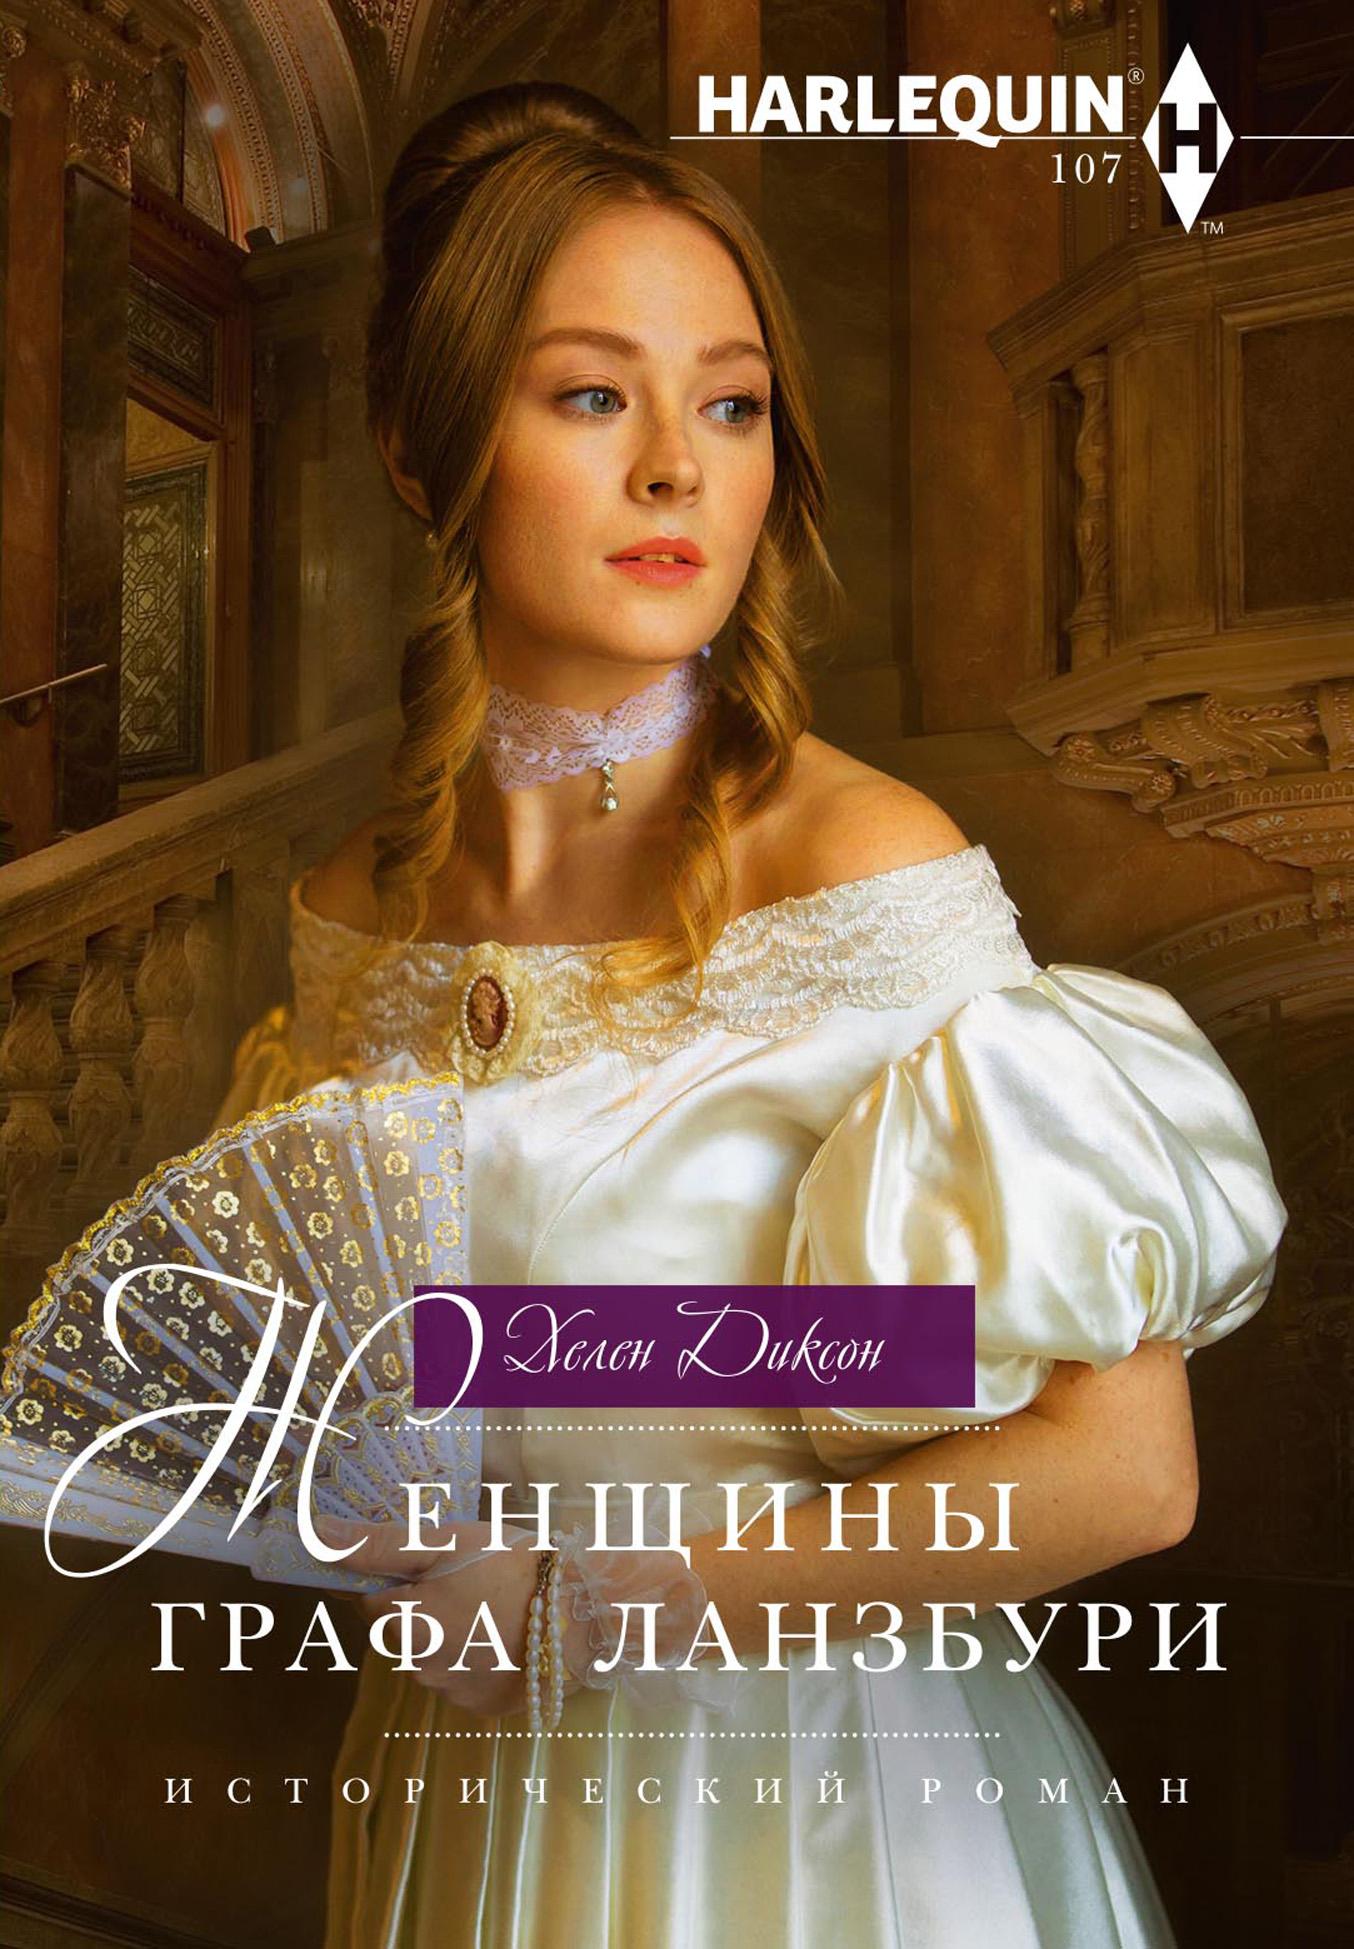 Женщины графа Ланзбури